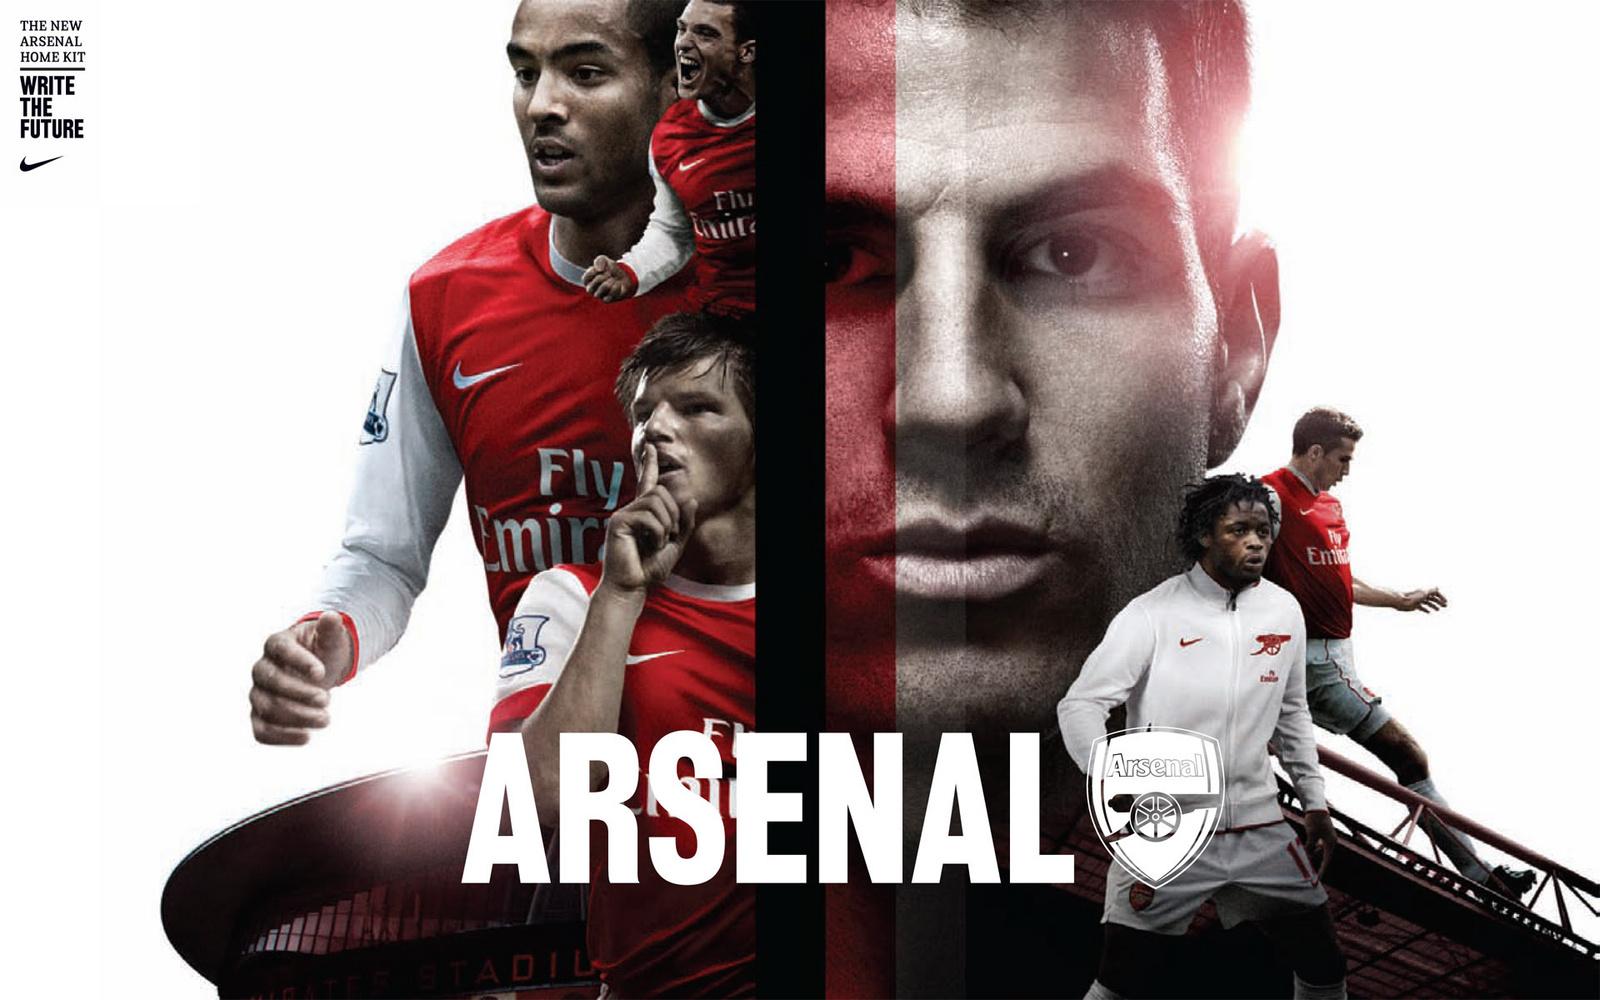 http://2.bp.blogspot.com/-5EmfplyXIPI/T3hkabuGcMI/AAAAAAAAAZw/sswQG_GfPKQ/s1600/arsenal-team-wallpaper.jpg